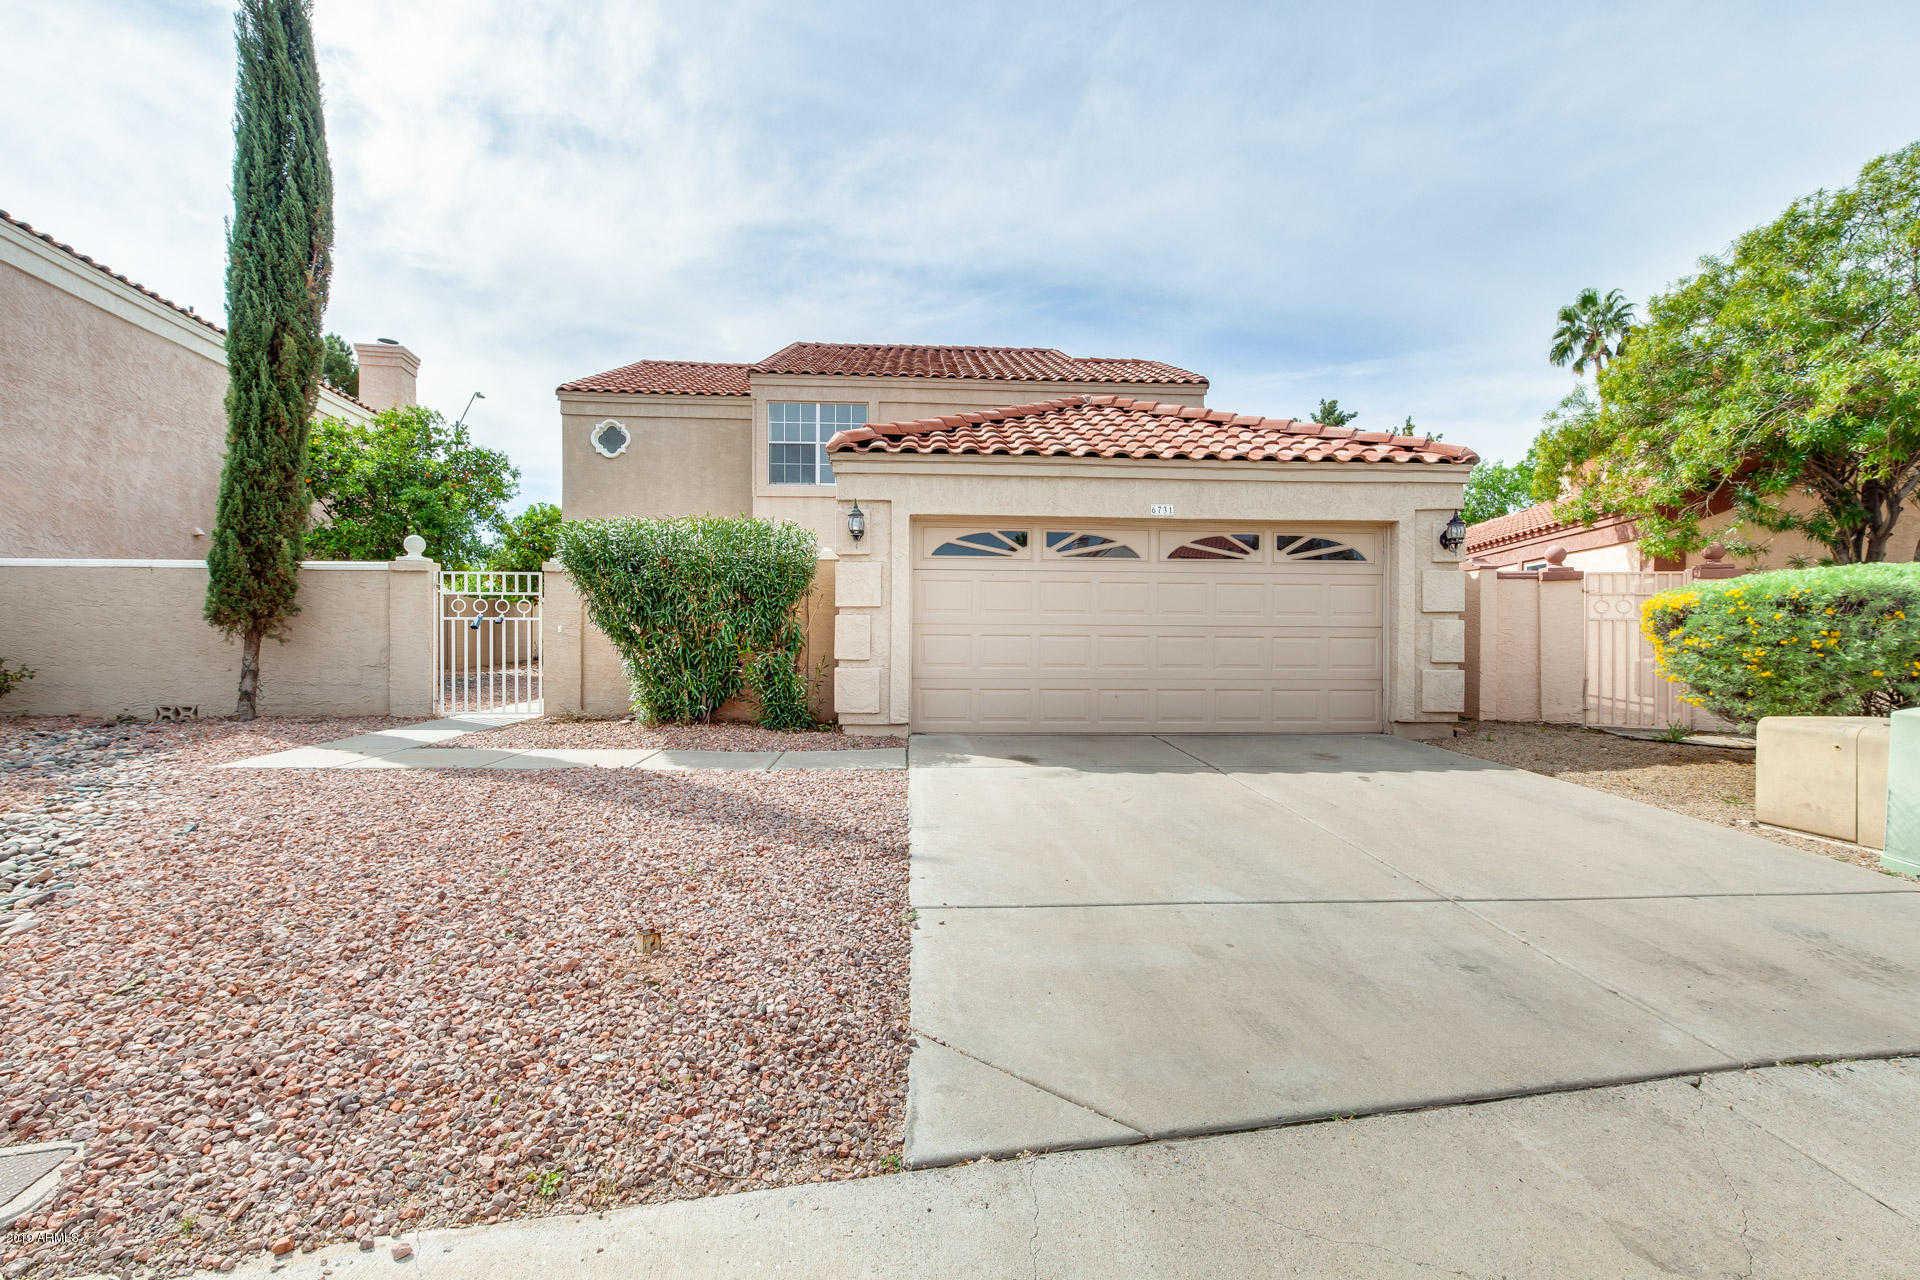 $312,000 - 4Br/2Ba - Home for Sale in Arrowhead Ranch 3 Amd Lot 1-225 Tr A, Glendale